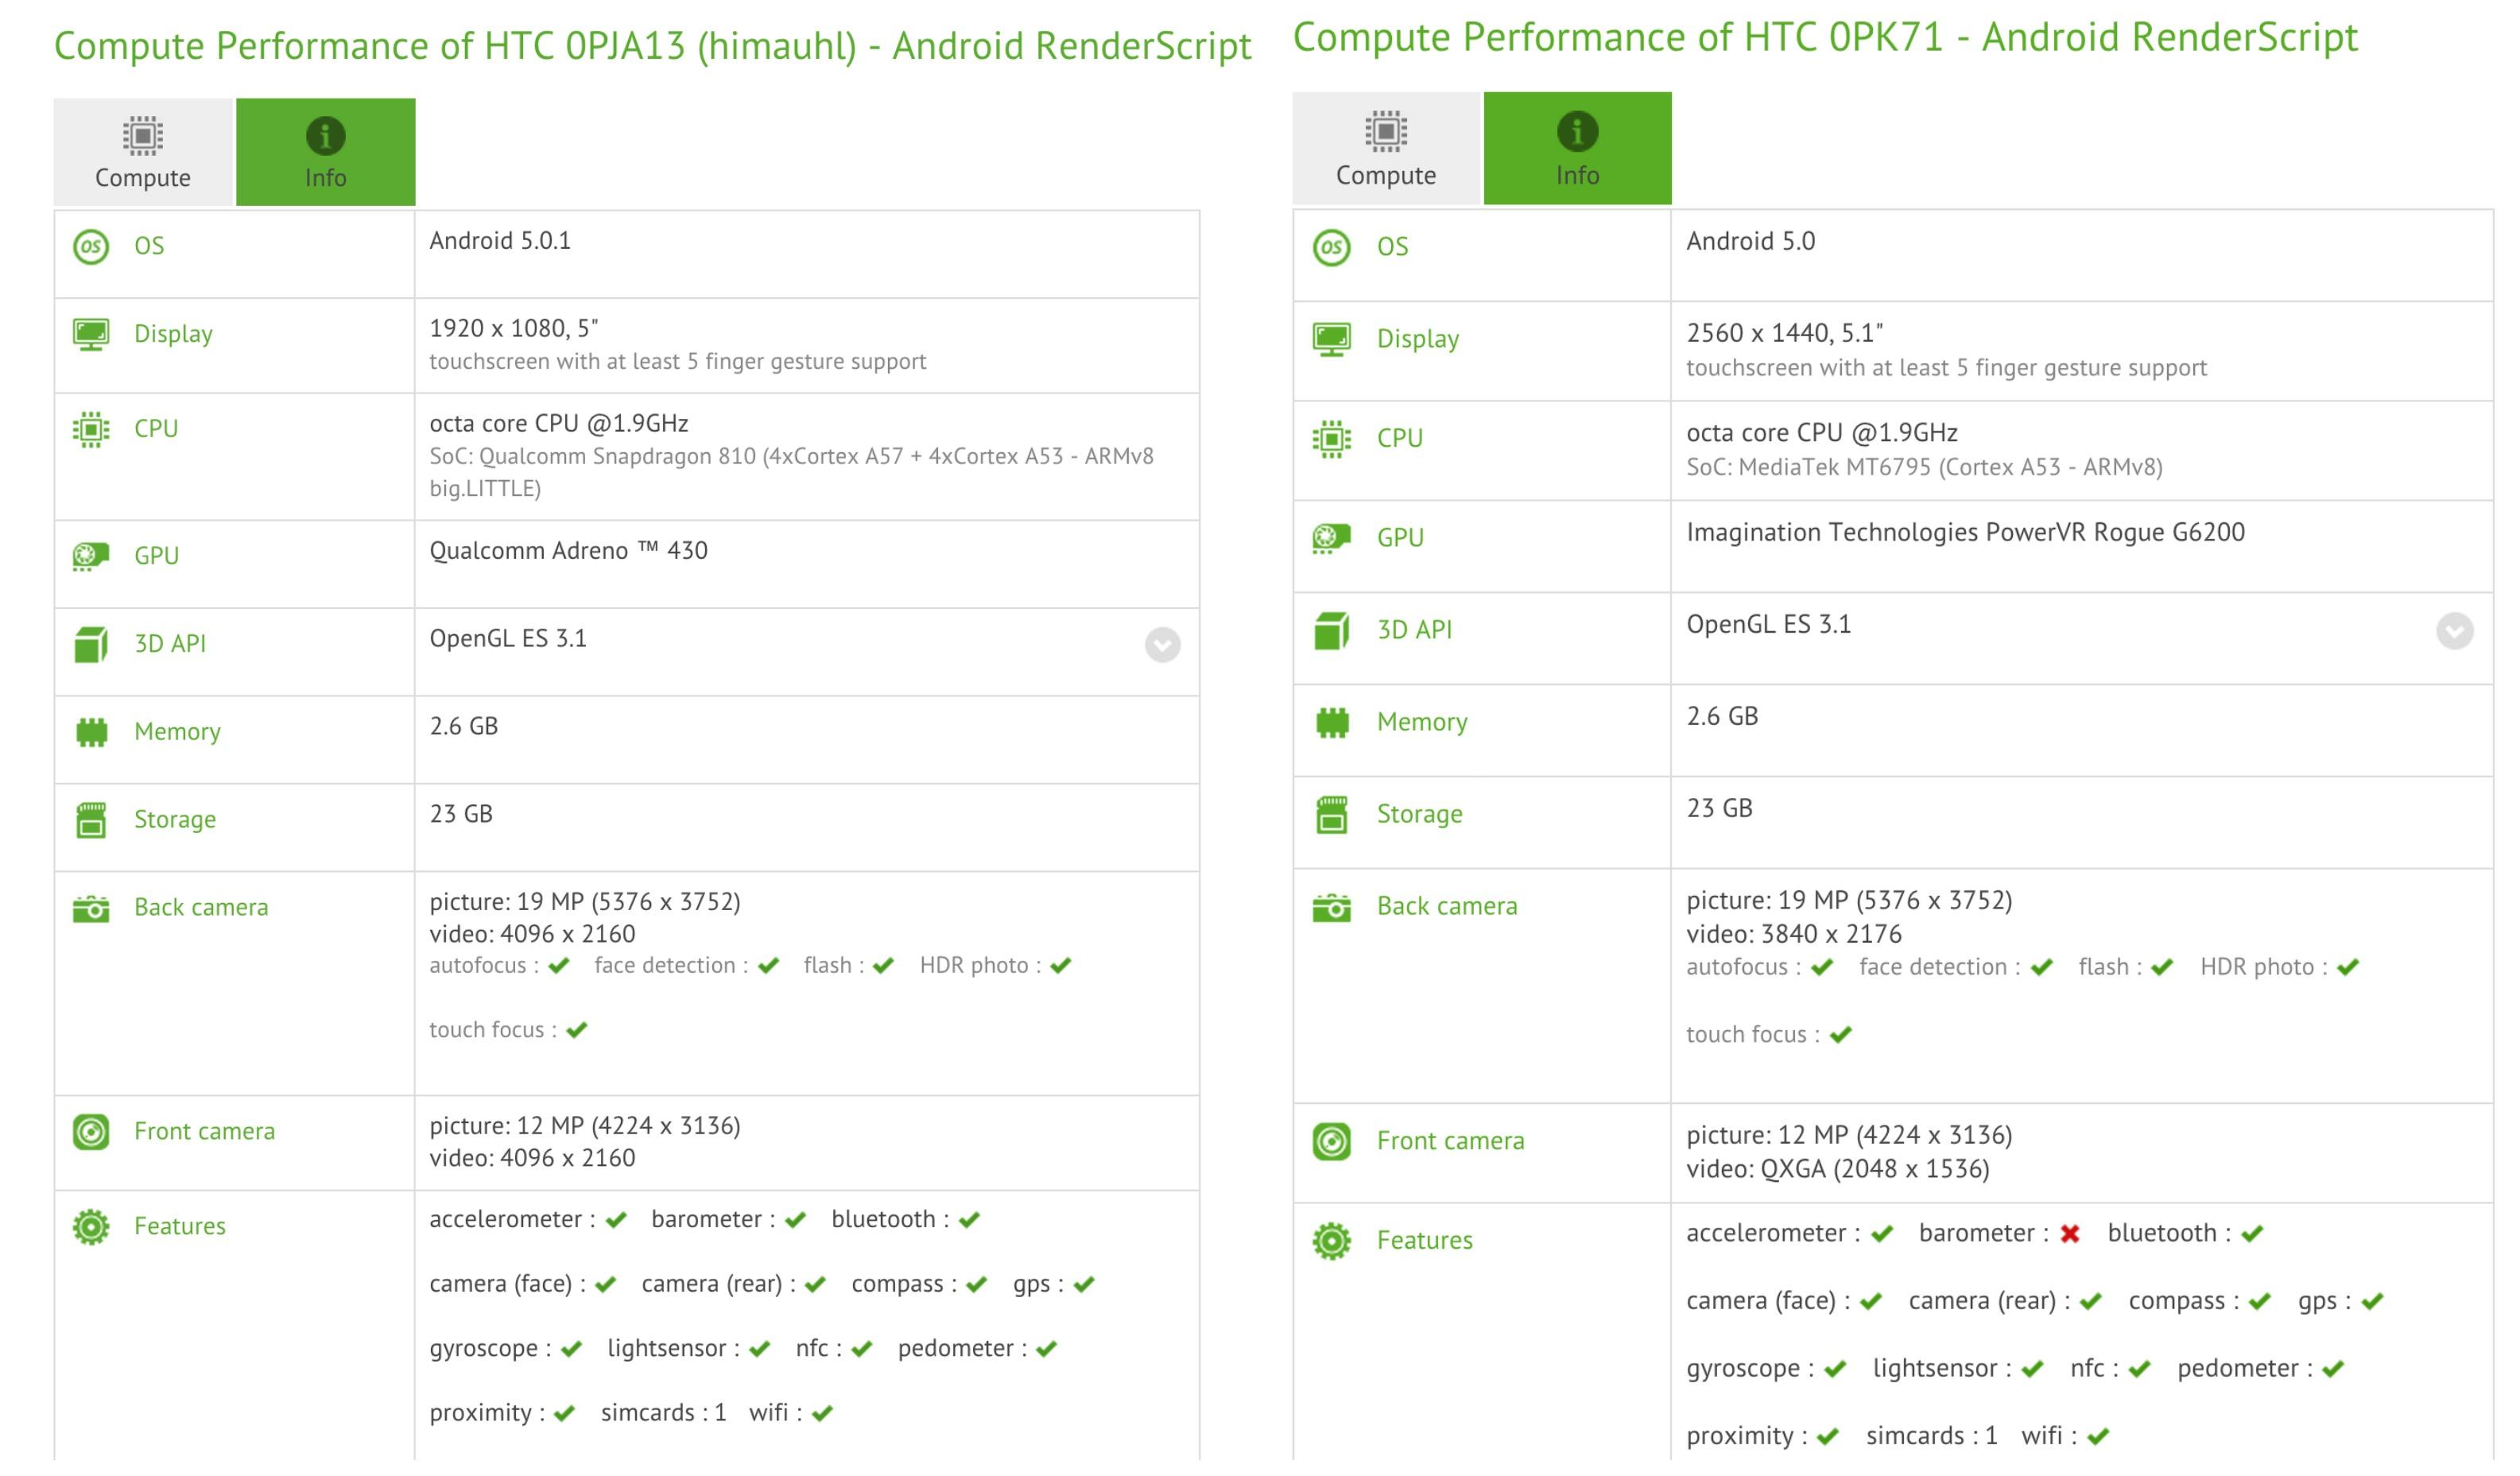 HTC M9 benchmarks